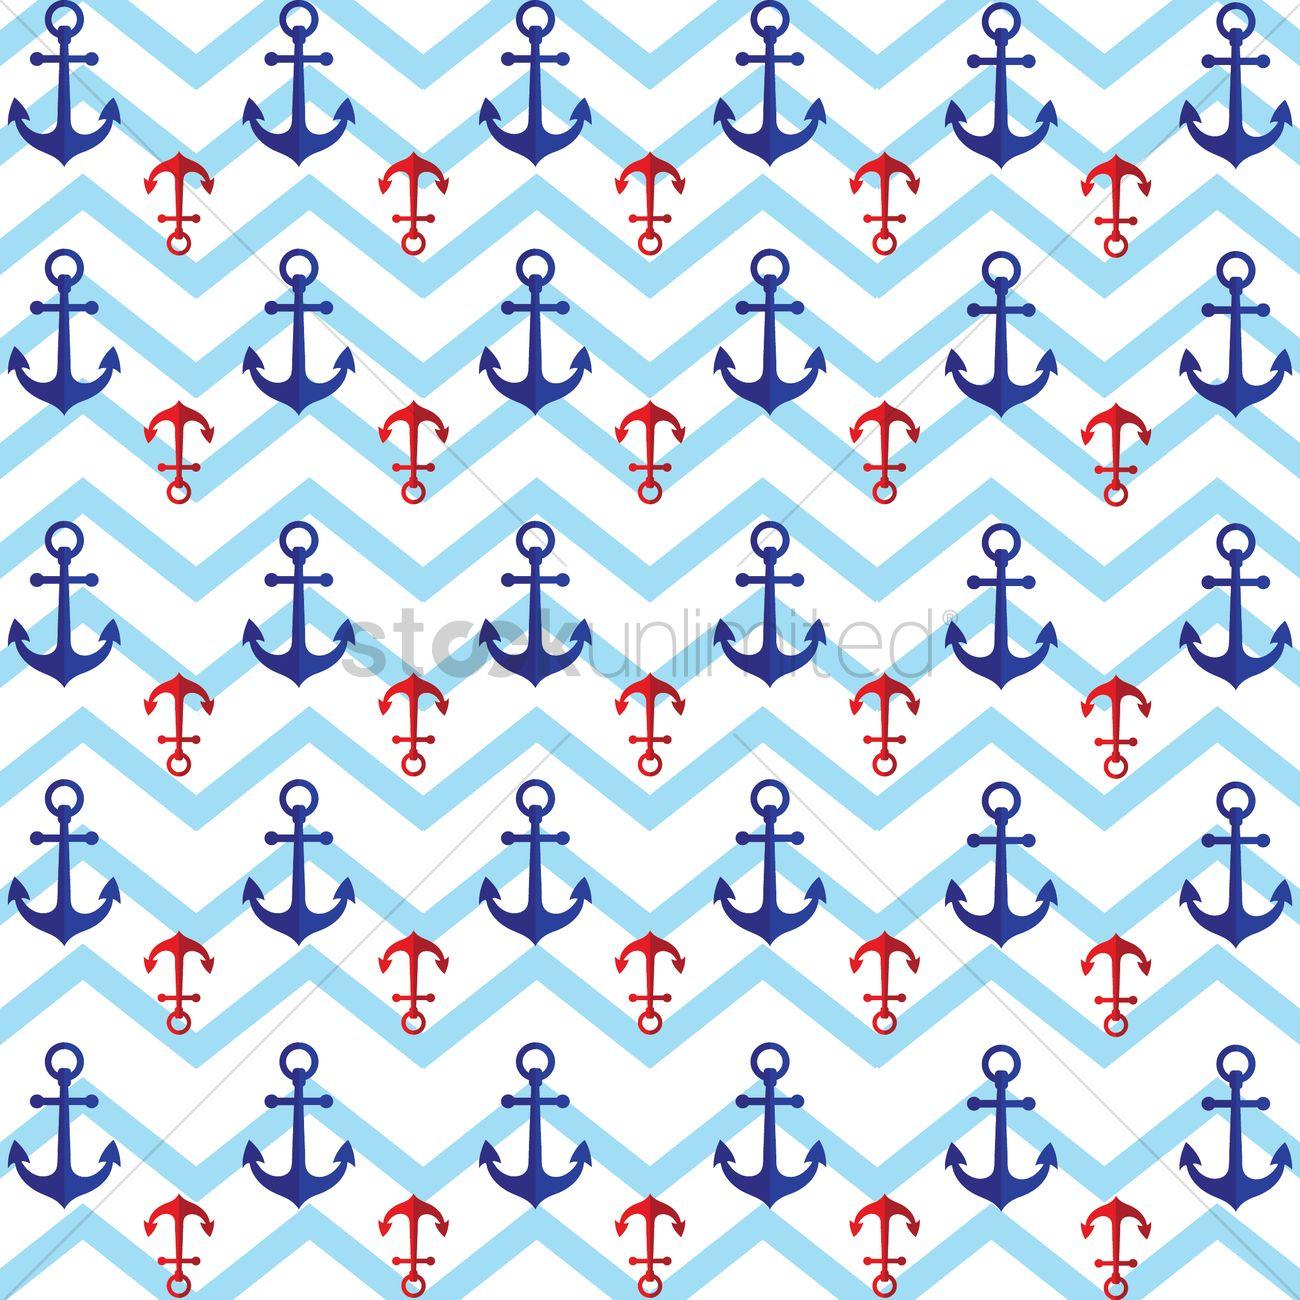 Anchor Patterns - Patterns Kid